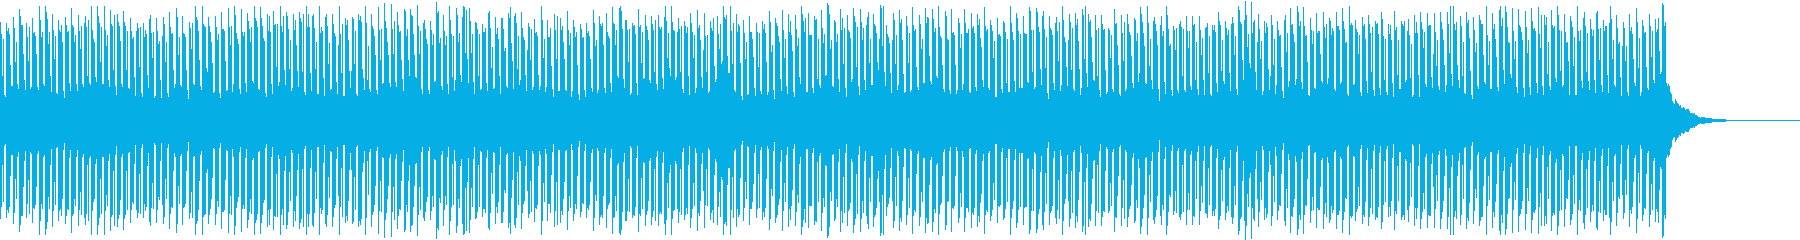 IT系・ニュース・データ エレクトロの再生済みの波形